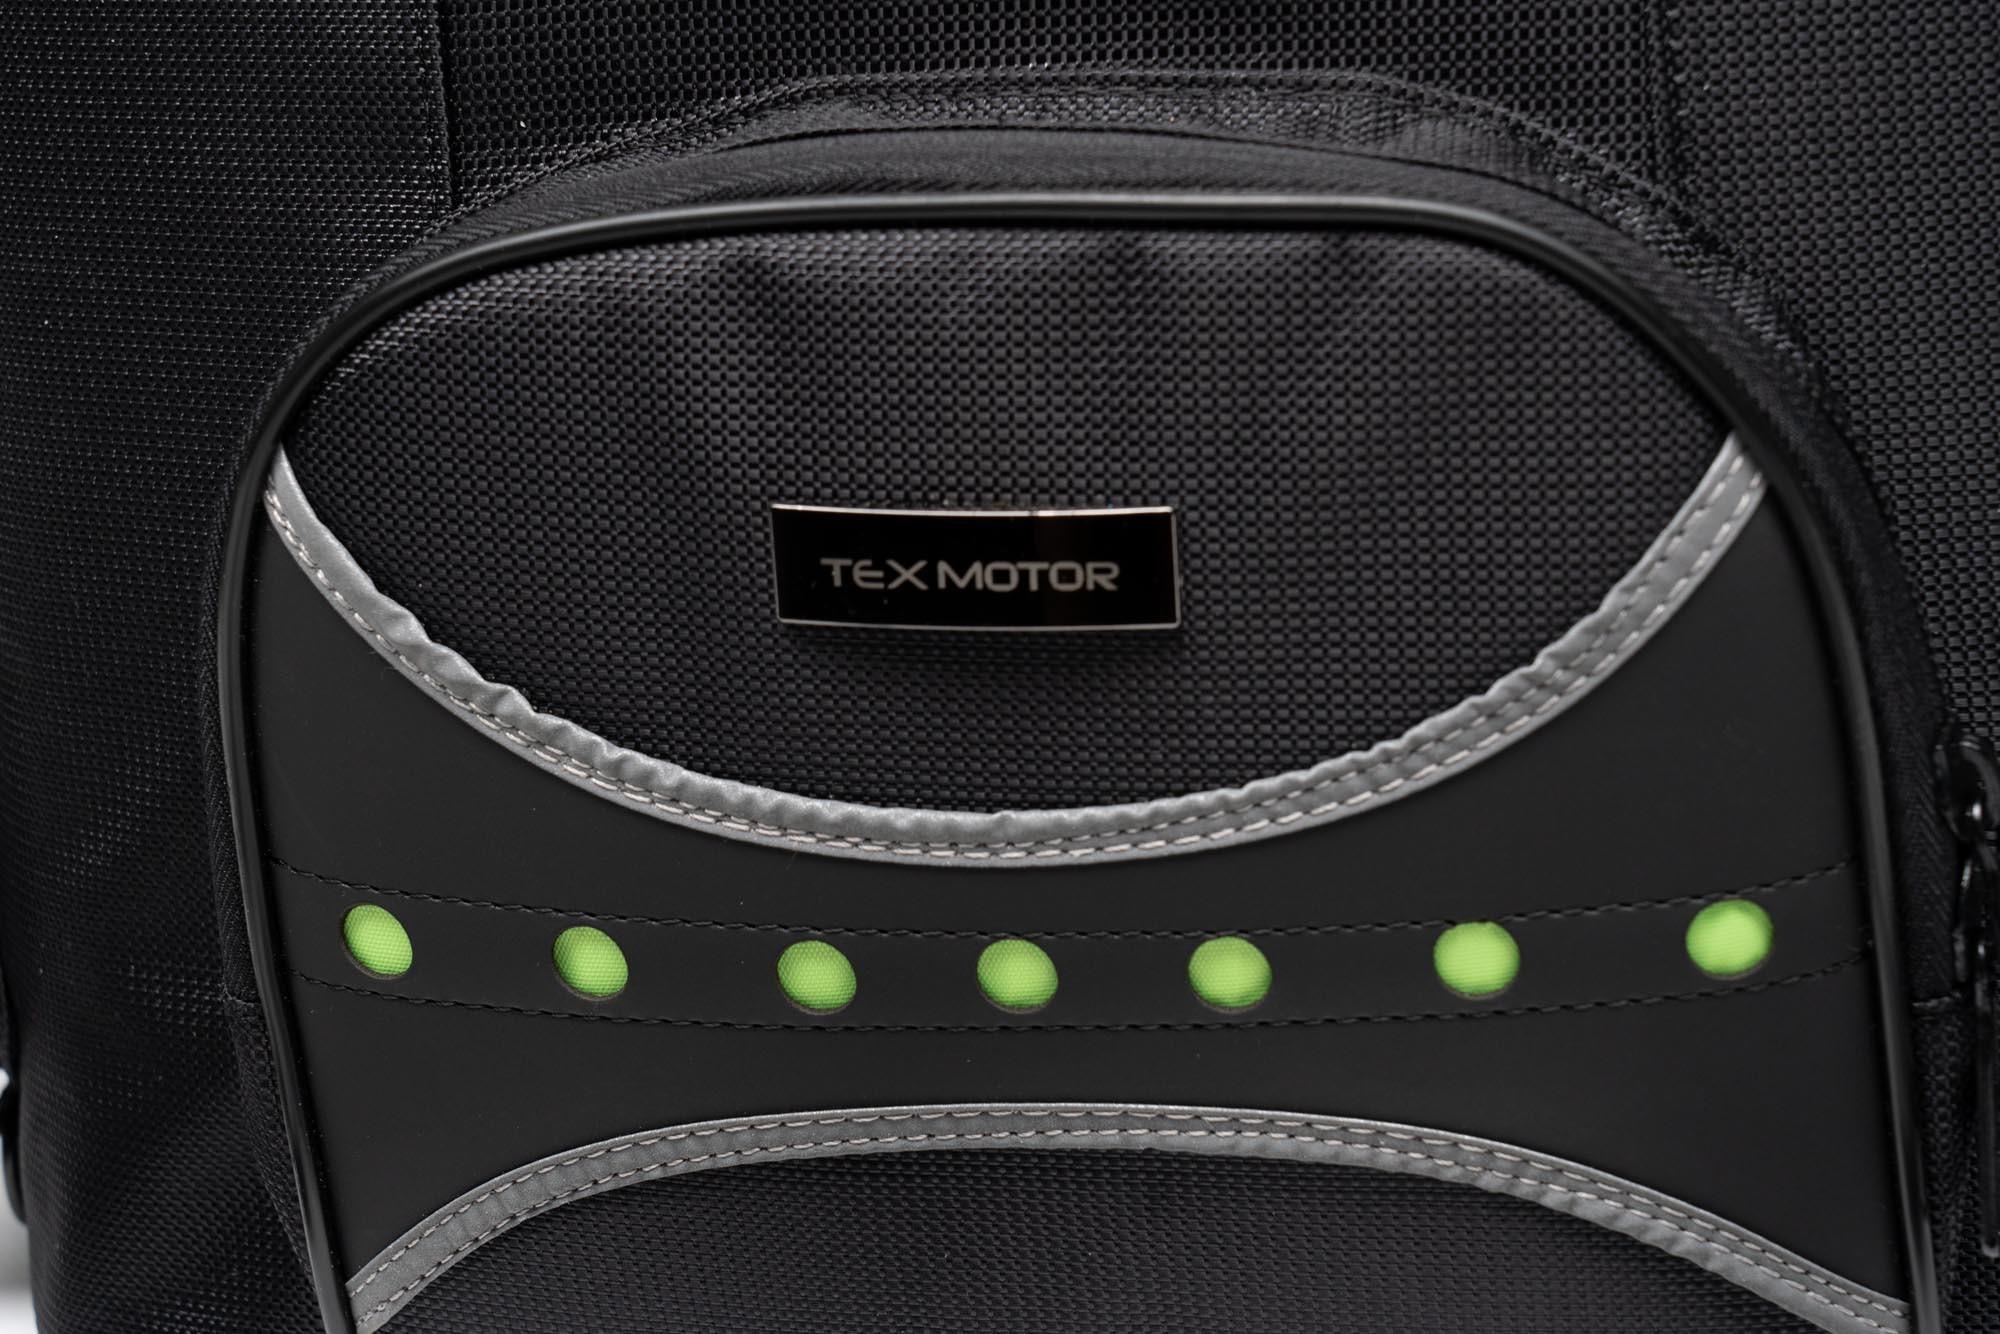 Front pocket of Tex Motor's 70025 motorcycle bag.